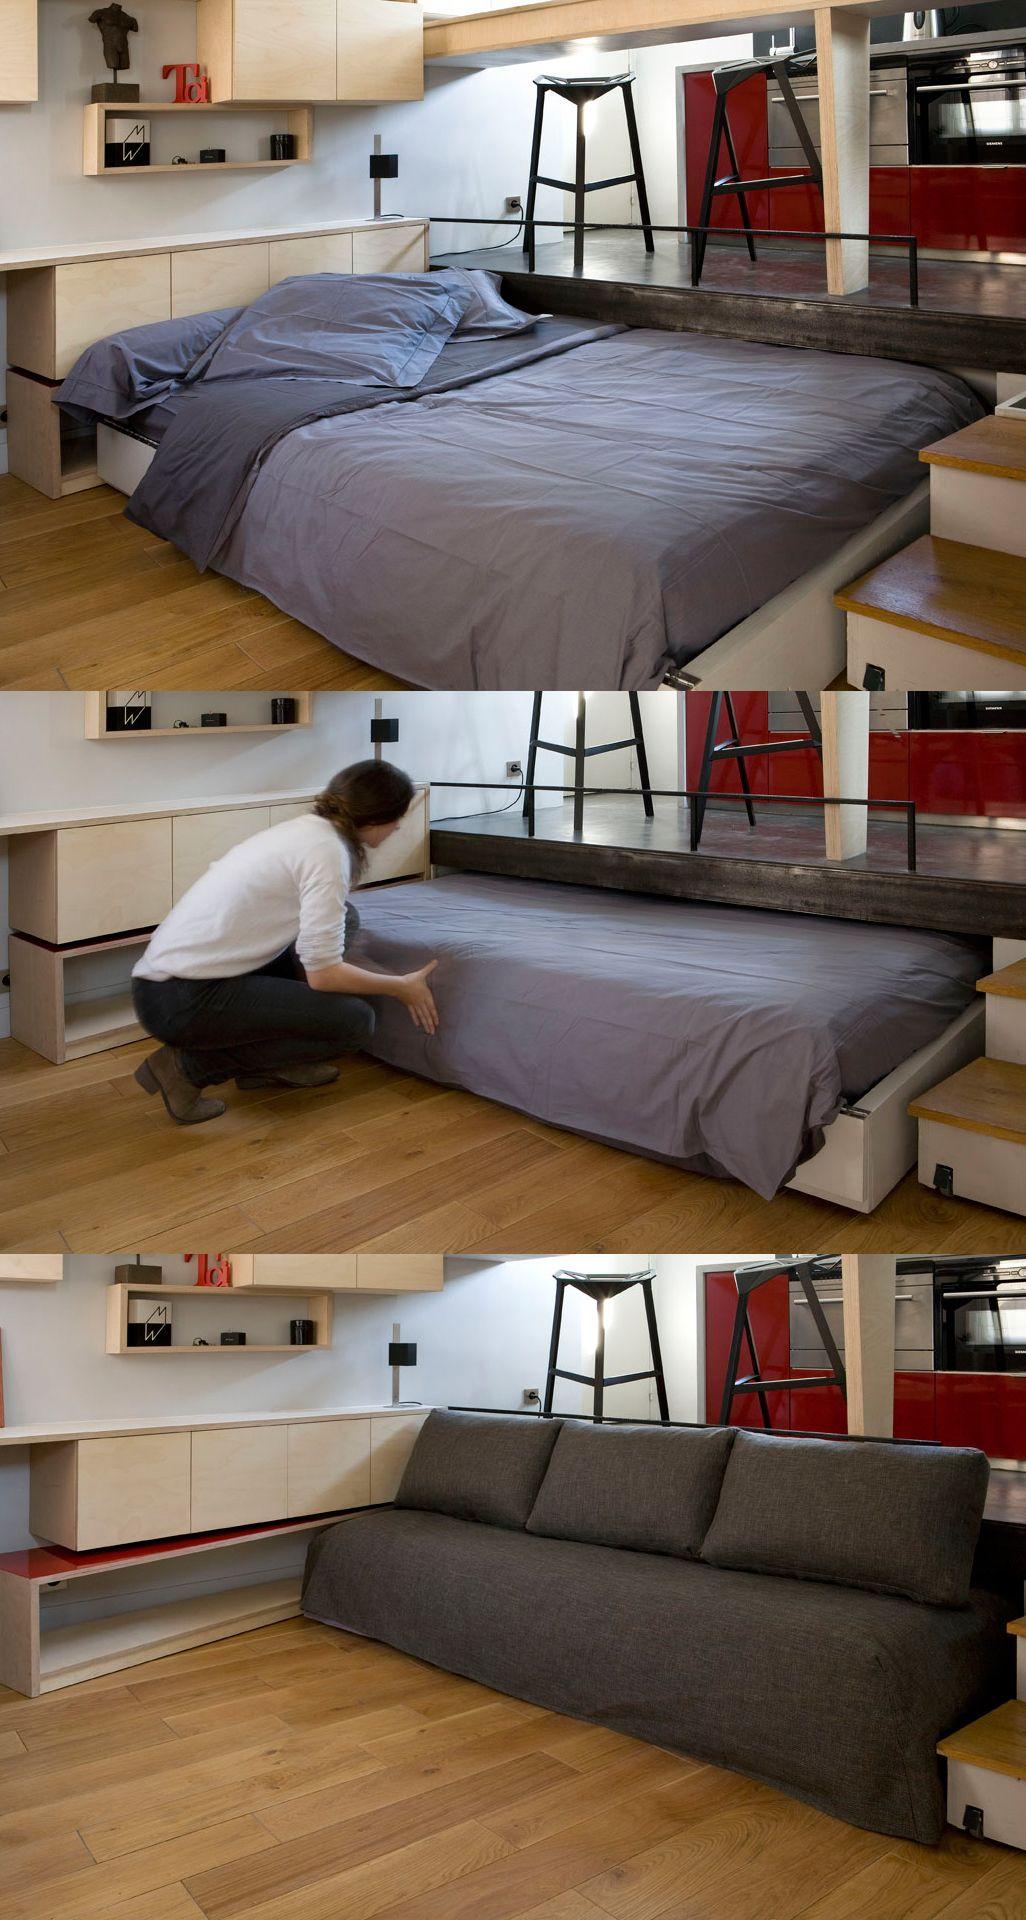 Great space saver! Bed slides under the kitchen floor, creating sofa for daytime use in studio apt. By Julie Nabucet.